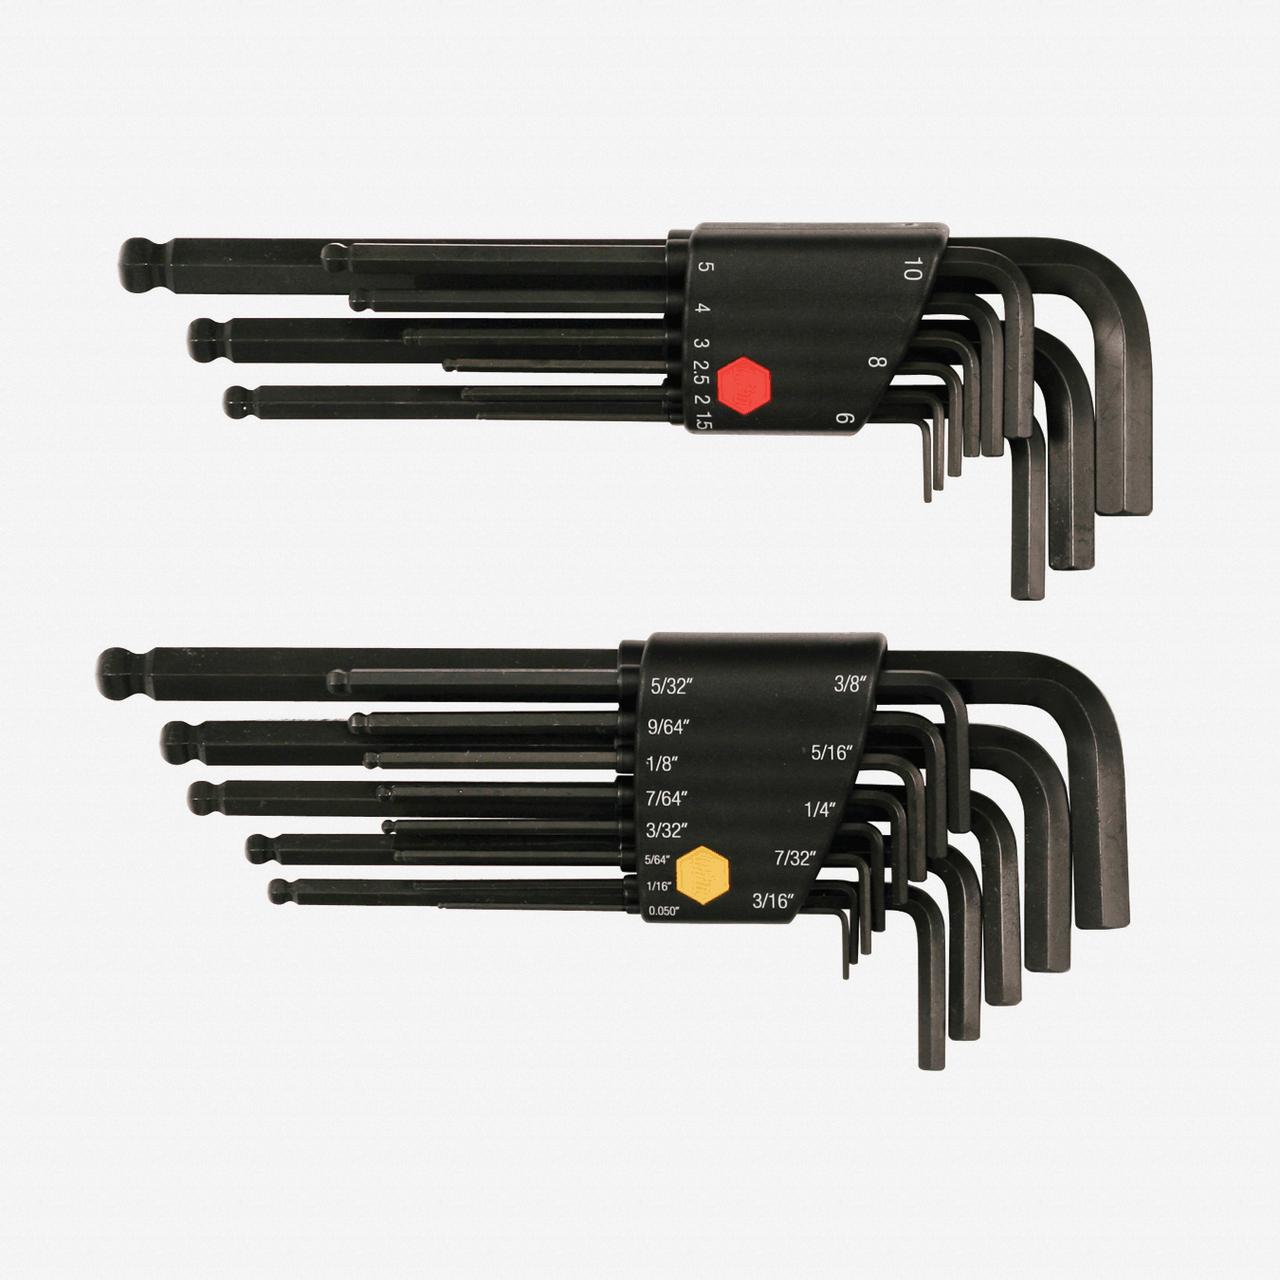 Wiha 36900 22 Piece Ball End Hex L-Key SAE and Metric Set - KC Tool